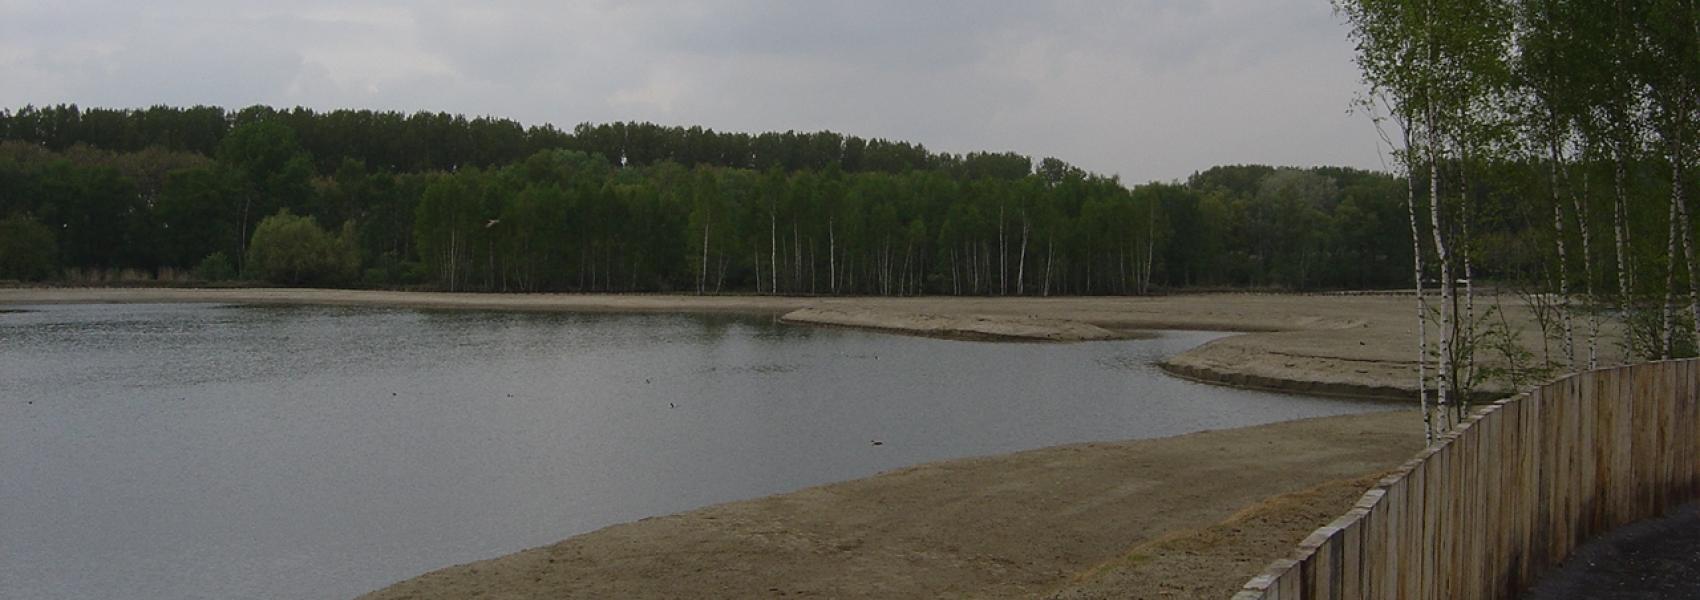 Kijkheuvel